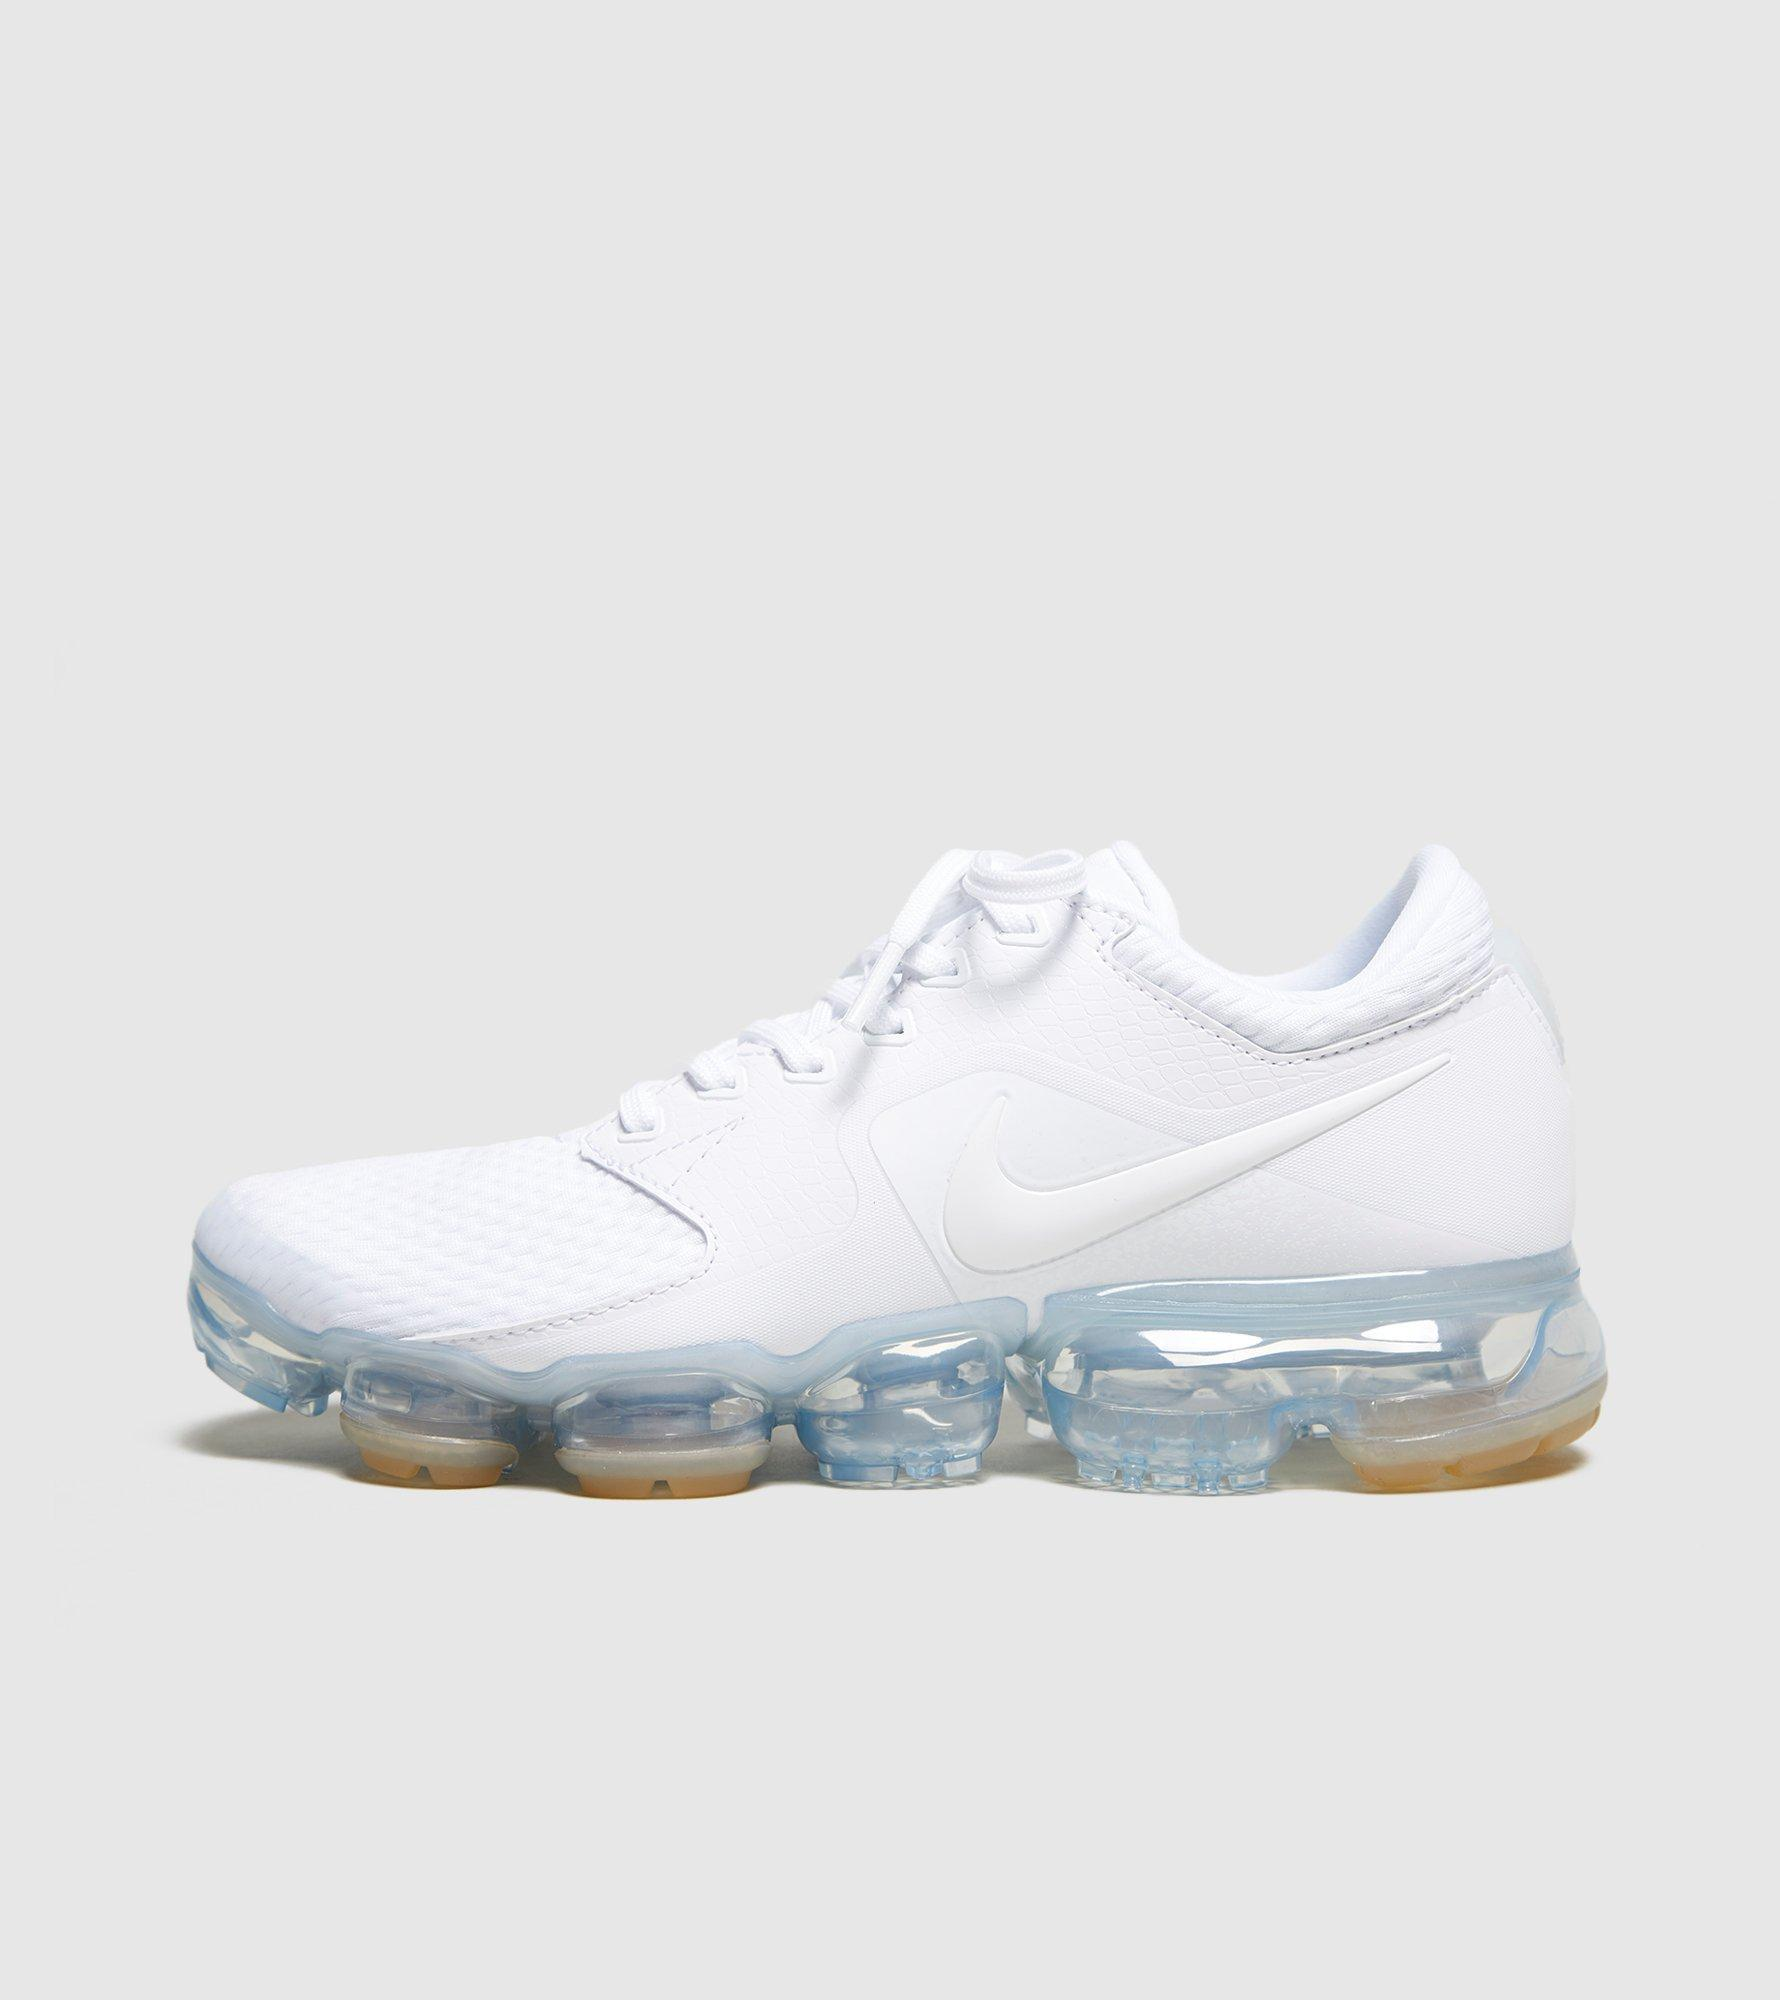 Lyst - Nike Air Vapormax Women s in White 2faa27cfc